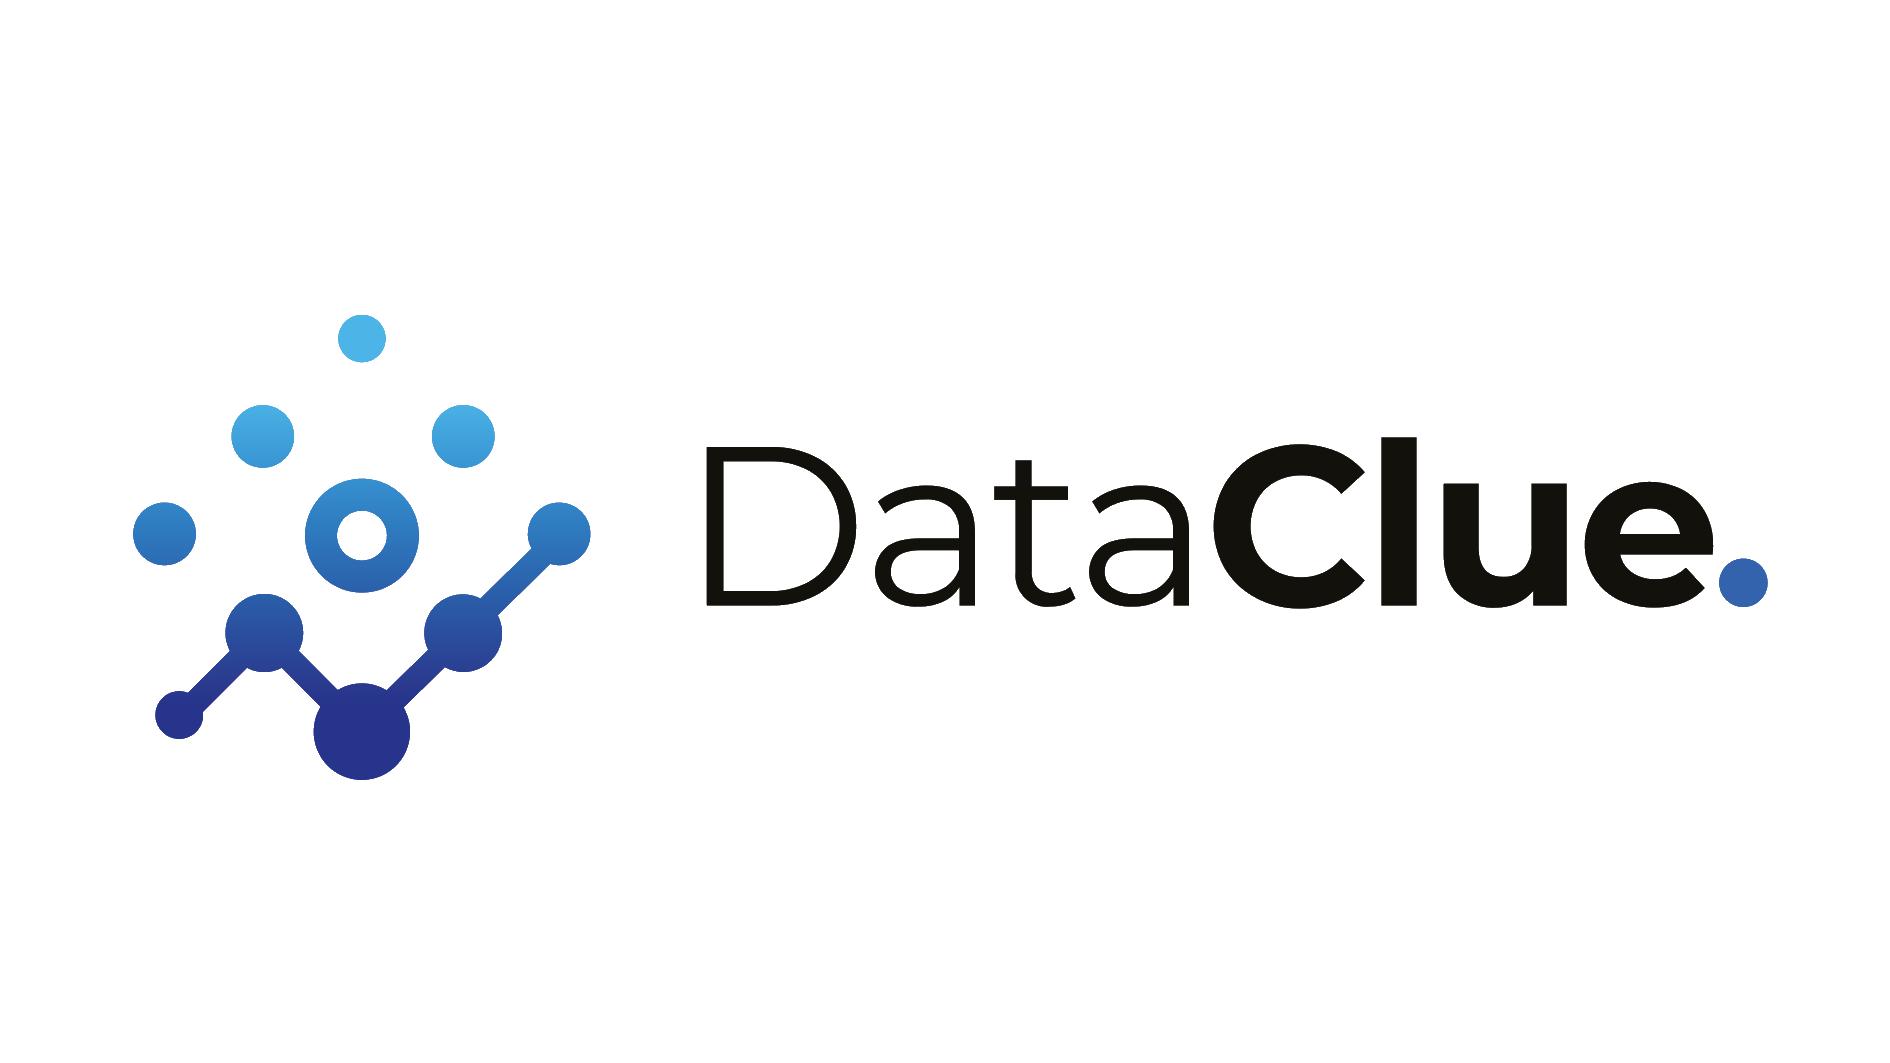 https://lightnings-football.de/wp-content/uploads/2021/01/DataClue-logo.png